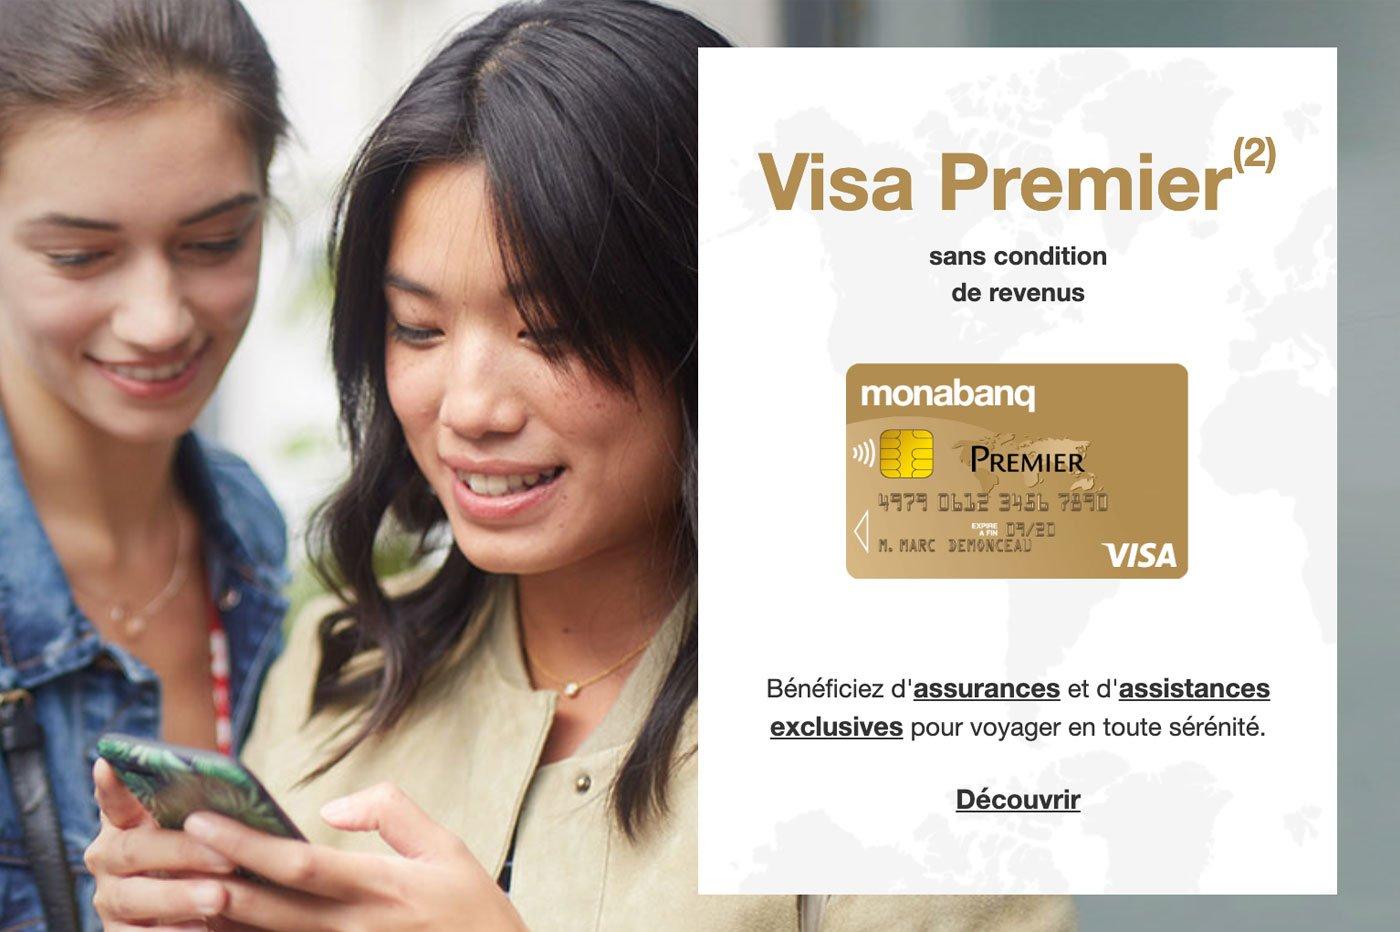 Carte Visa Premier Monabanq Prix Plafond Et Garanties